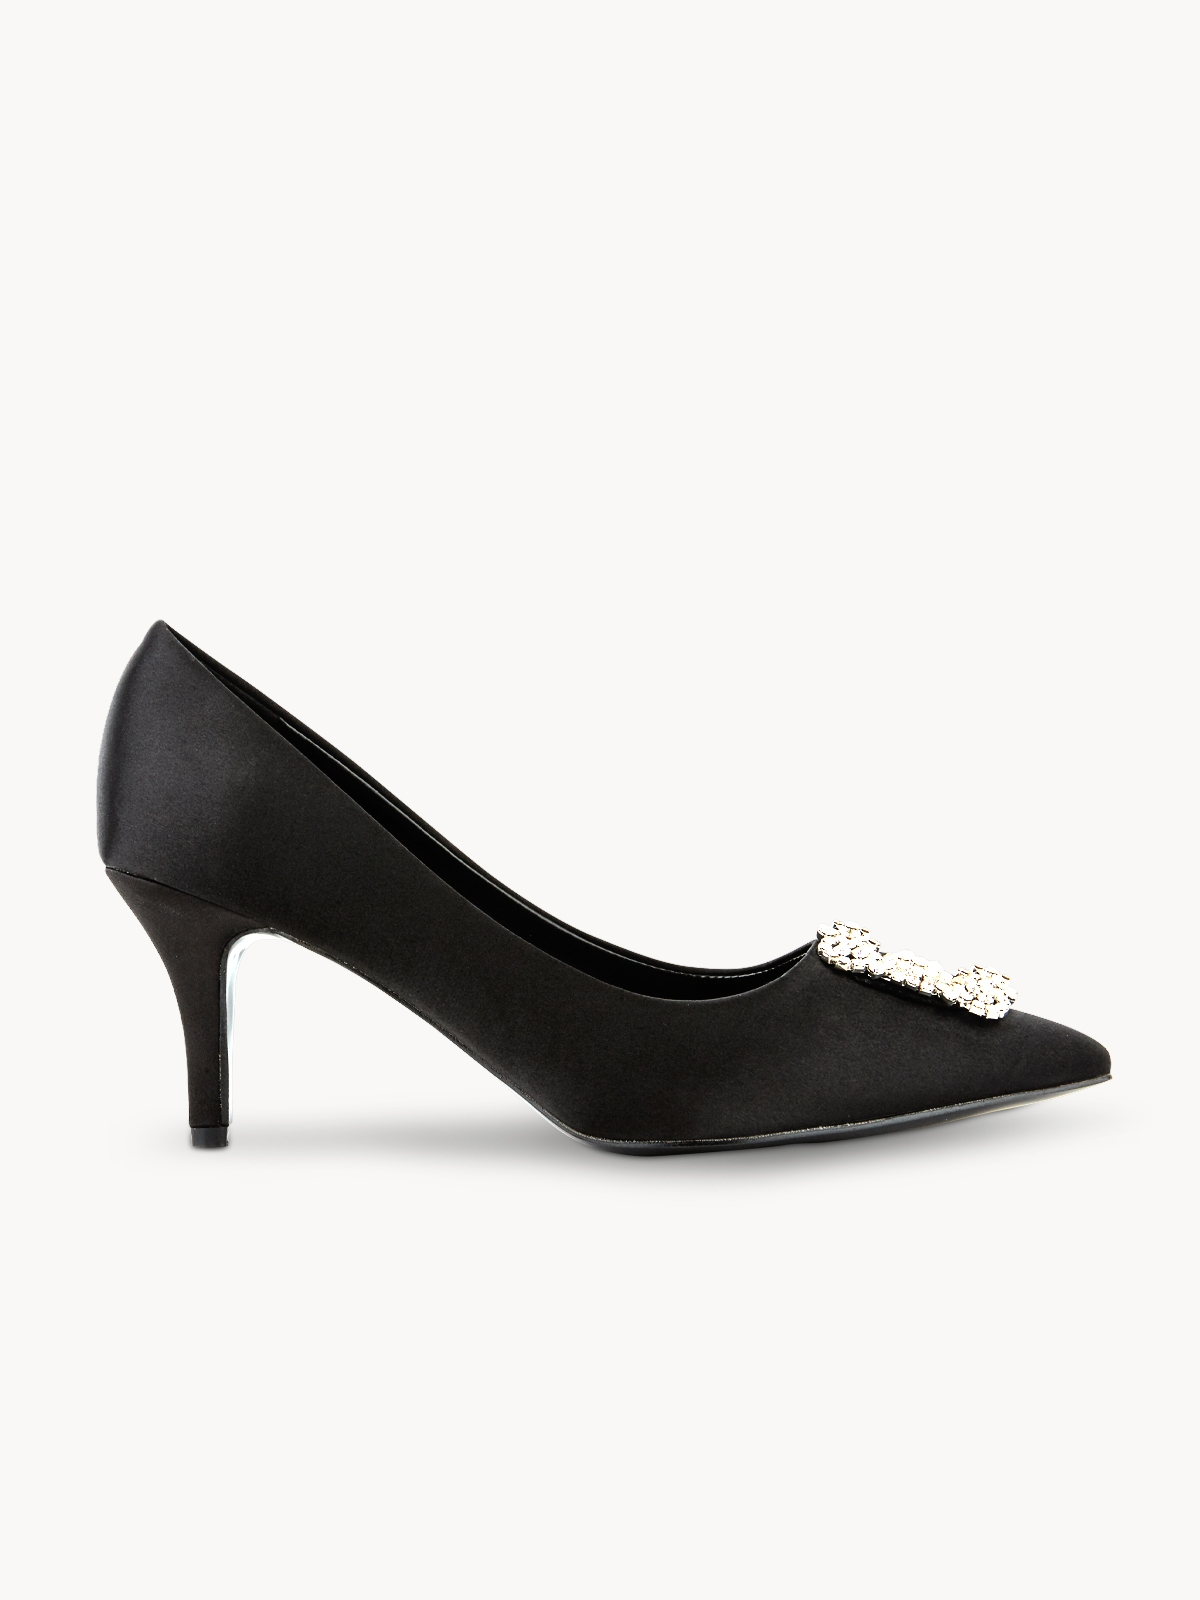 LookAtWe Amber High Heels Black